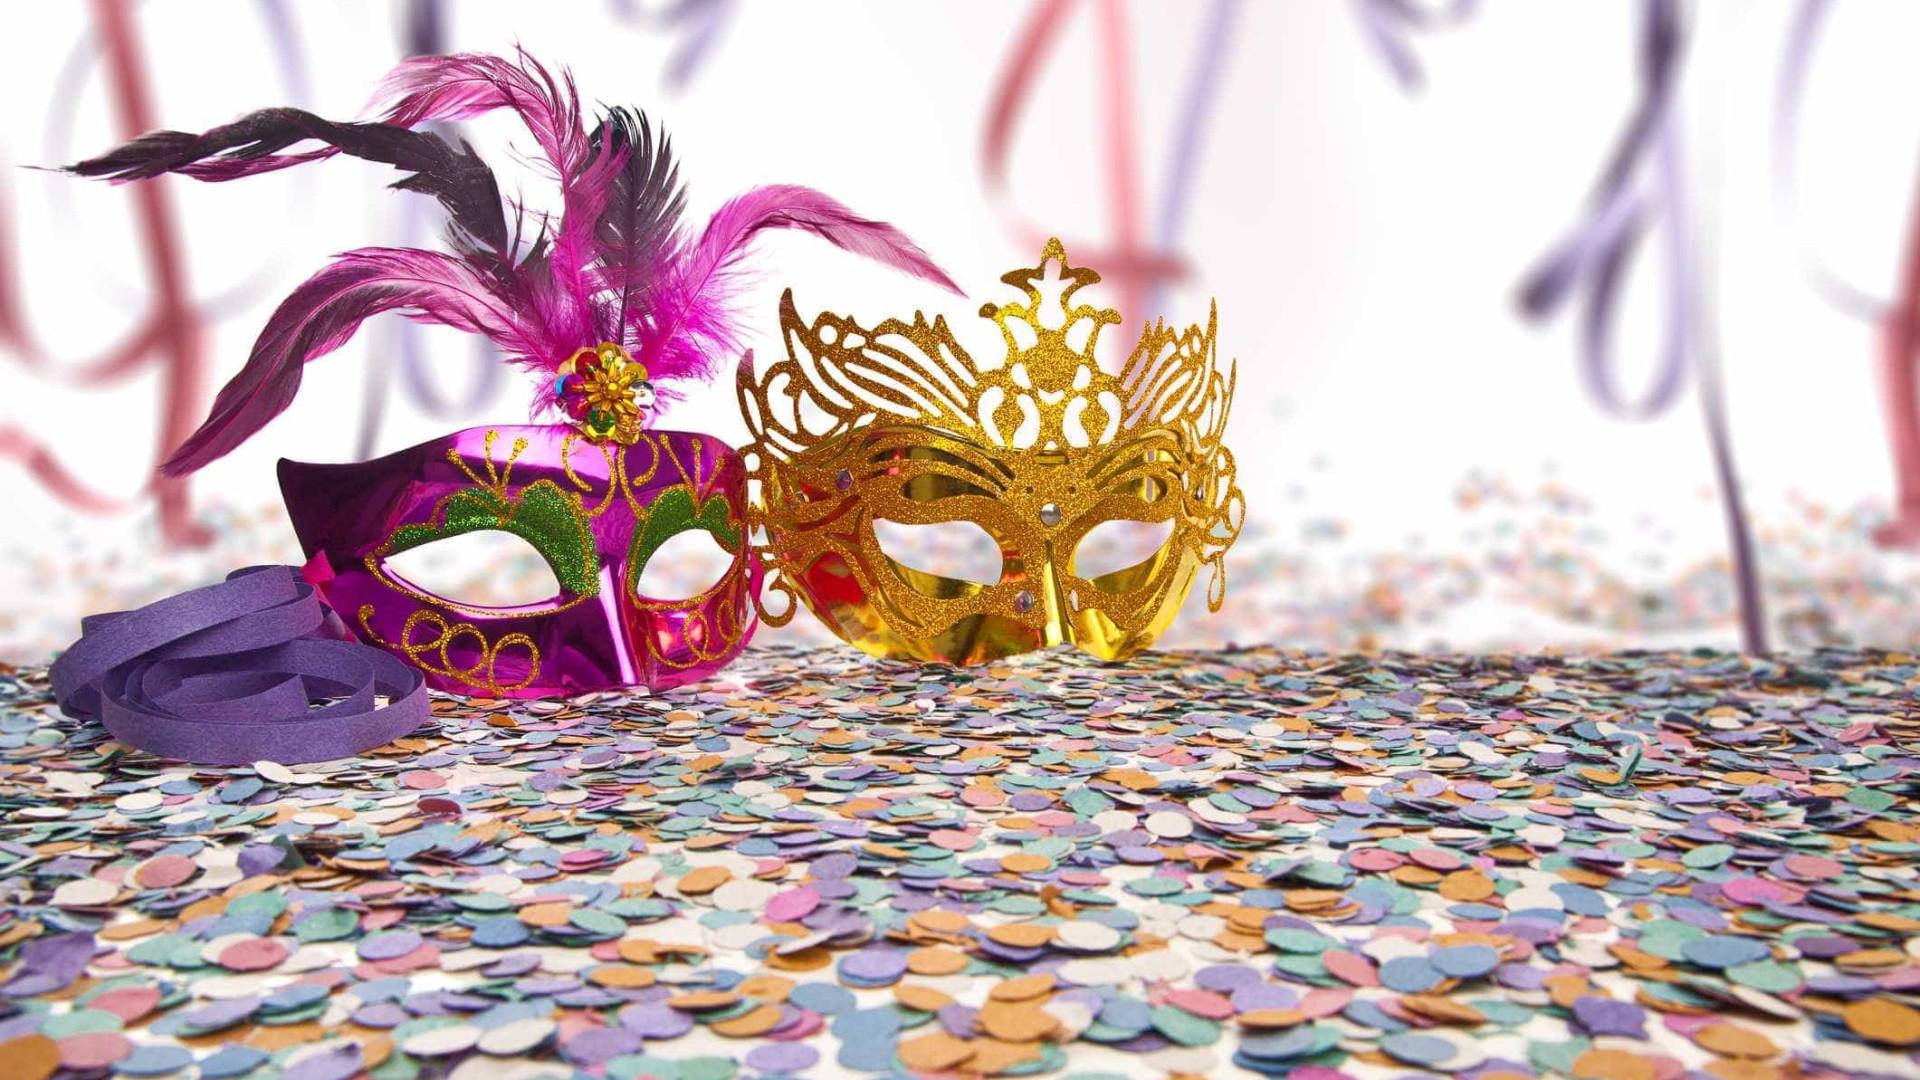 "Glitter e confetis, ""os piores inimigos do Carnaval"". Quercus deixa apelo"